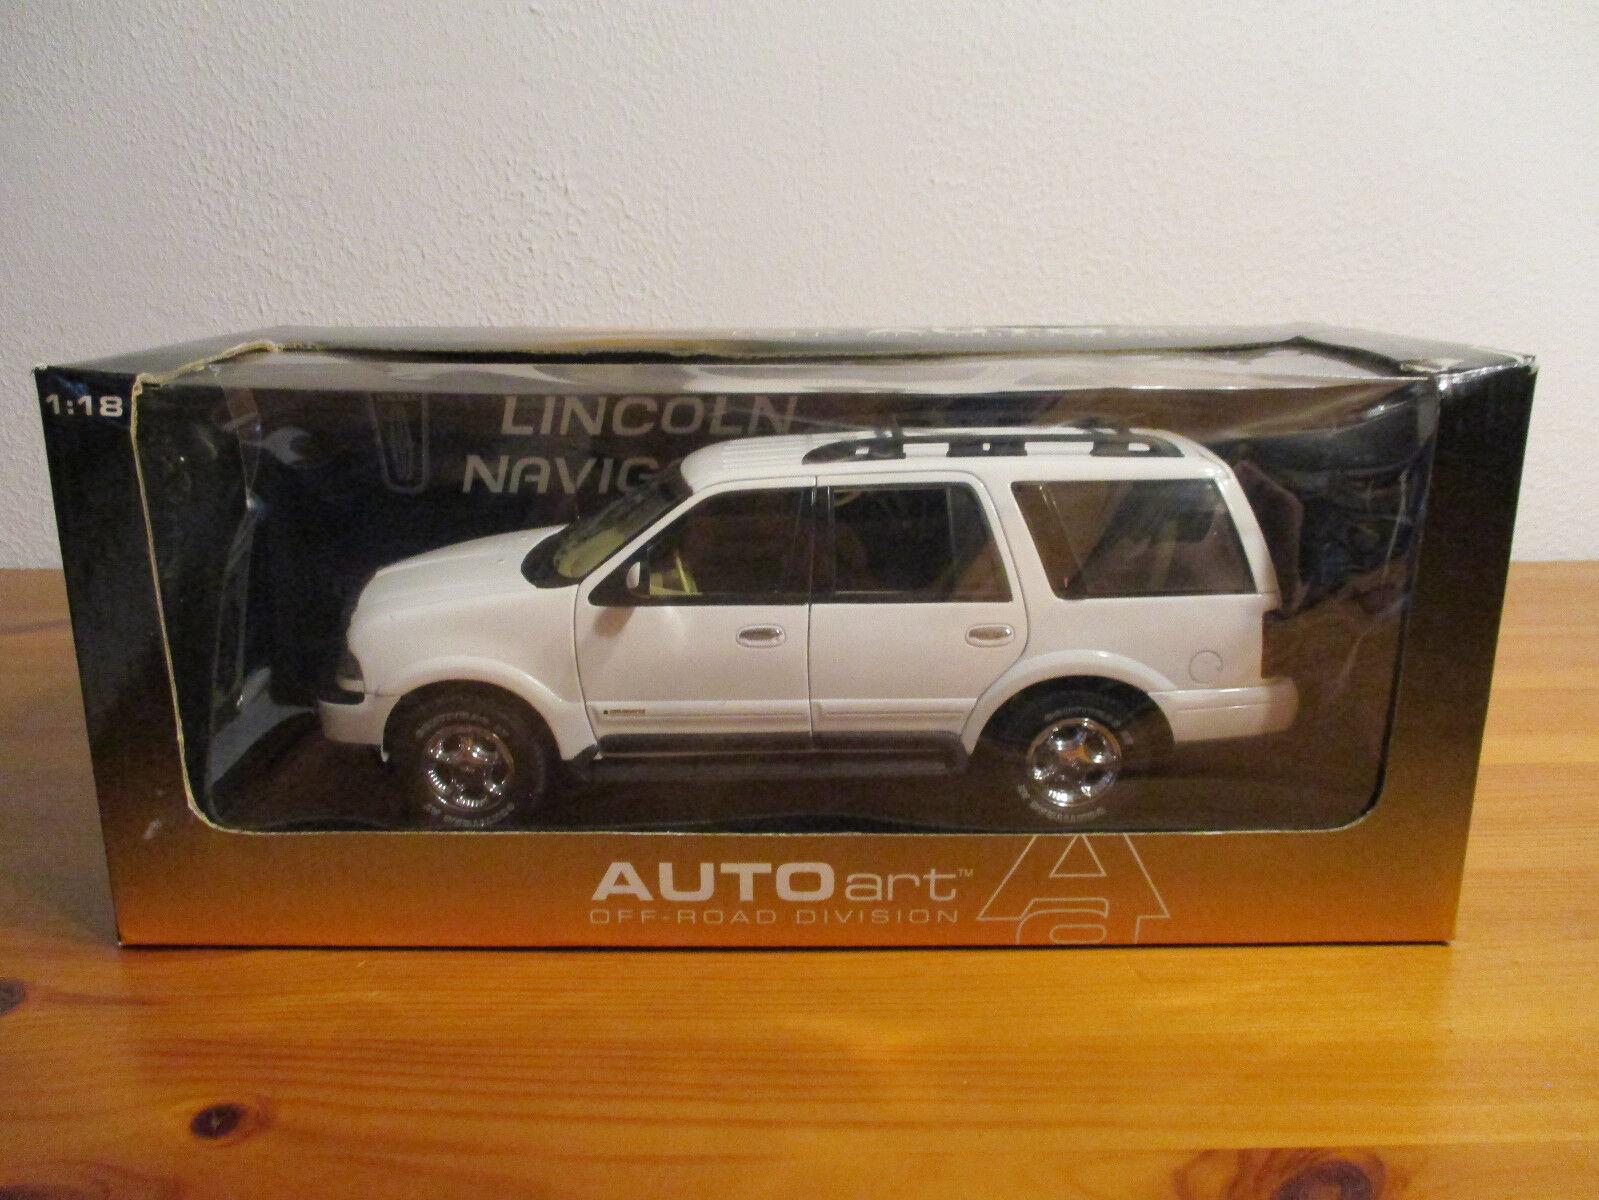 (Gor) 1 18 AutoArt Ford Lincoln Navigator NIP